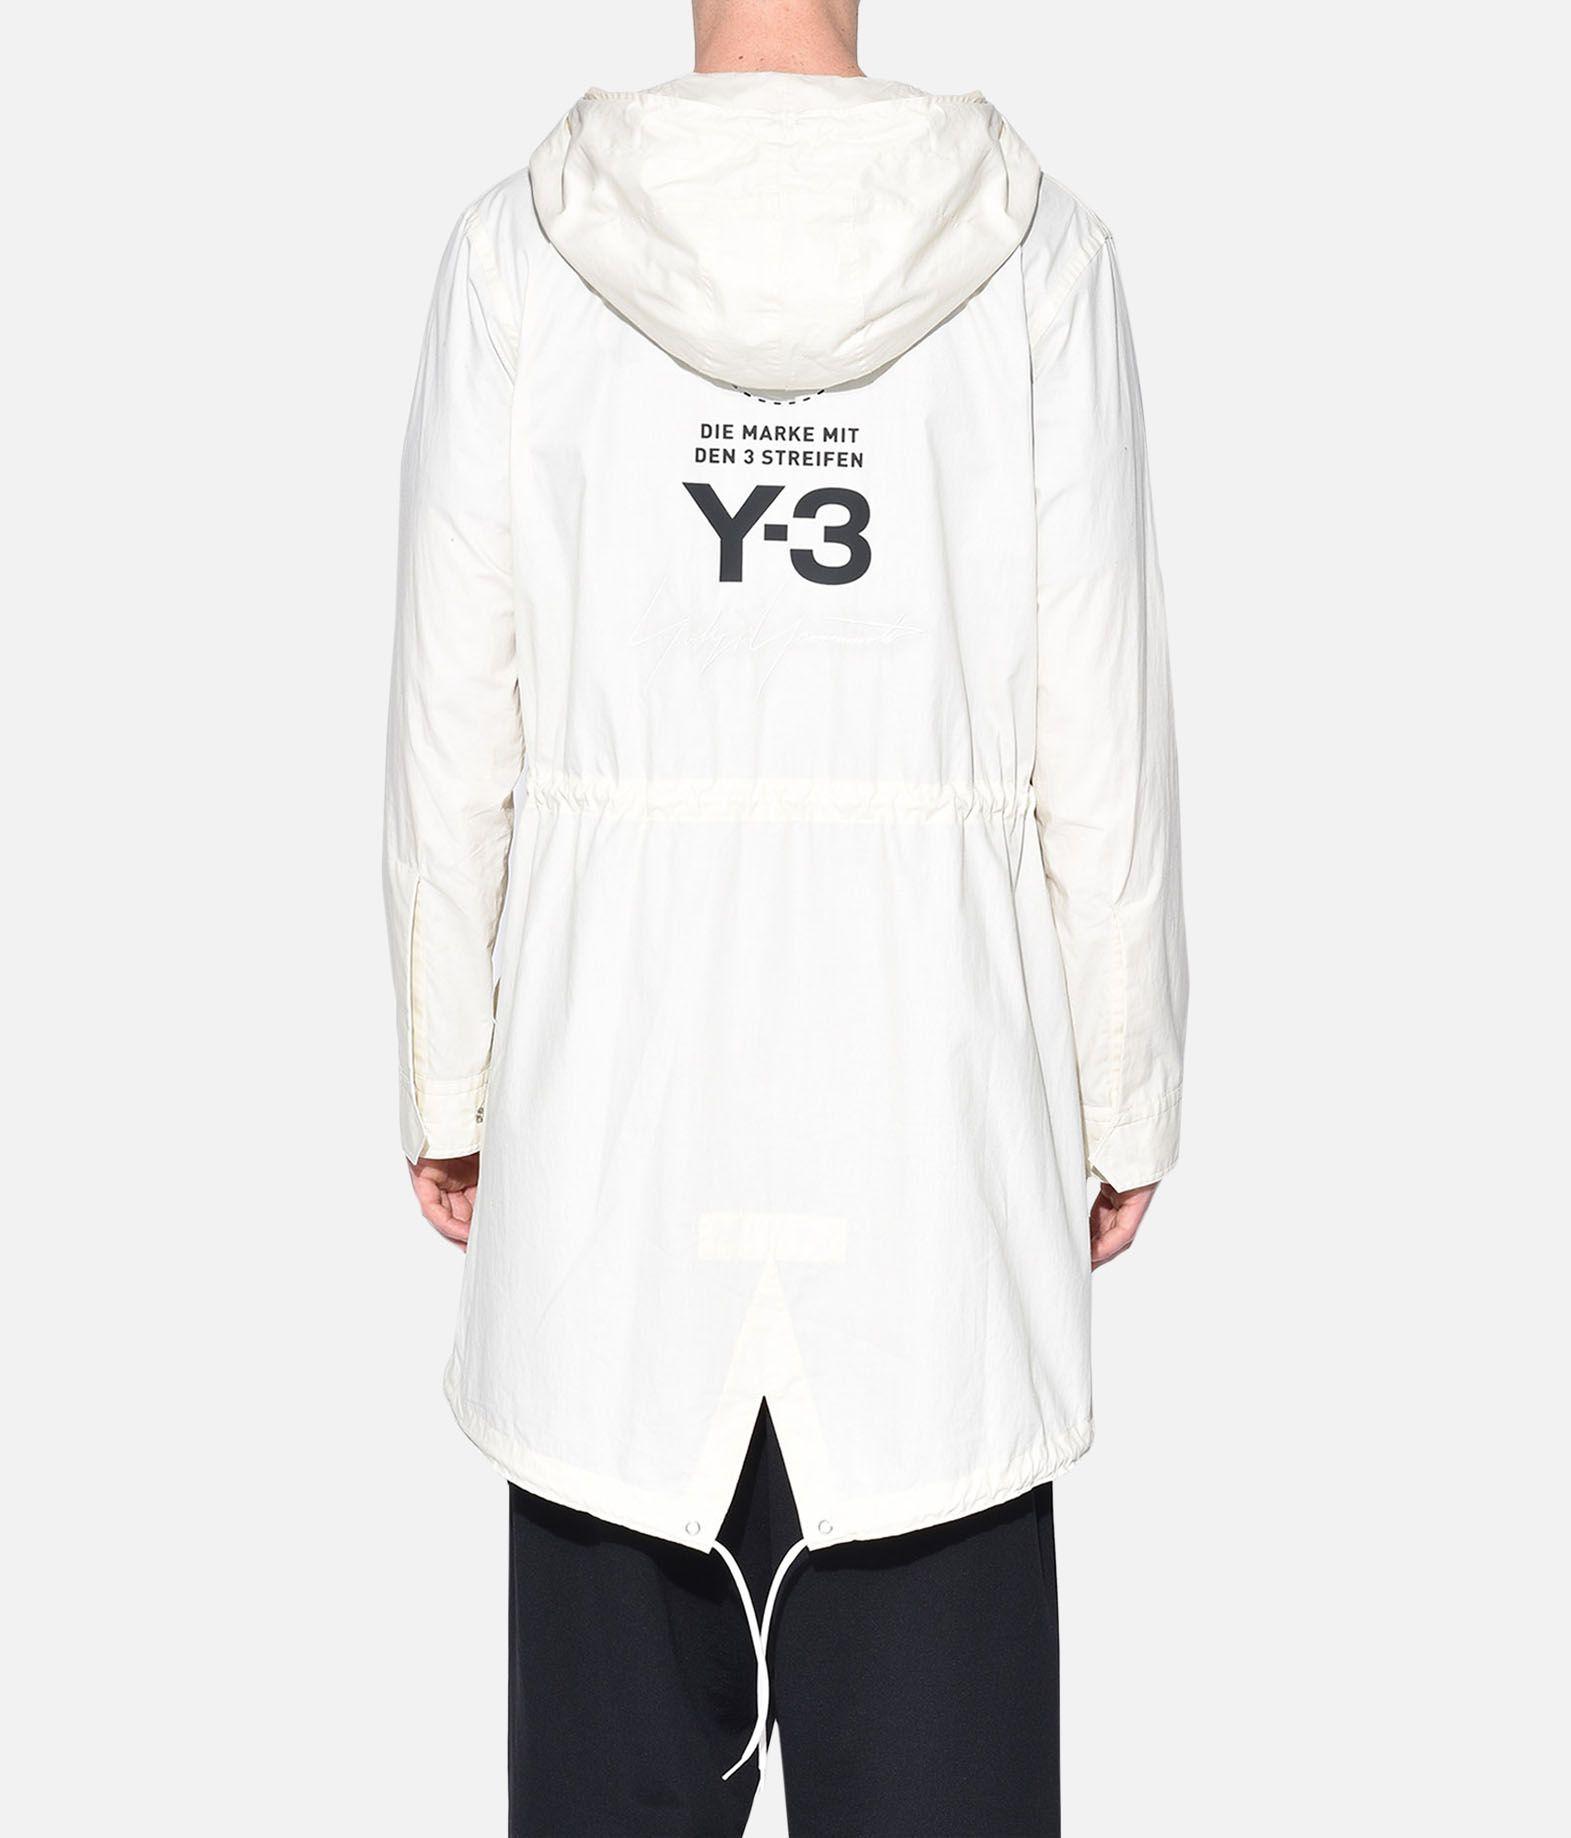 Y-3 Y-3 Mod Parka Shirt Пиджак Для Мужчин d